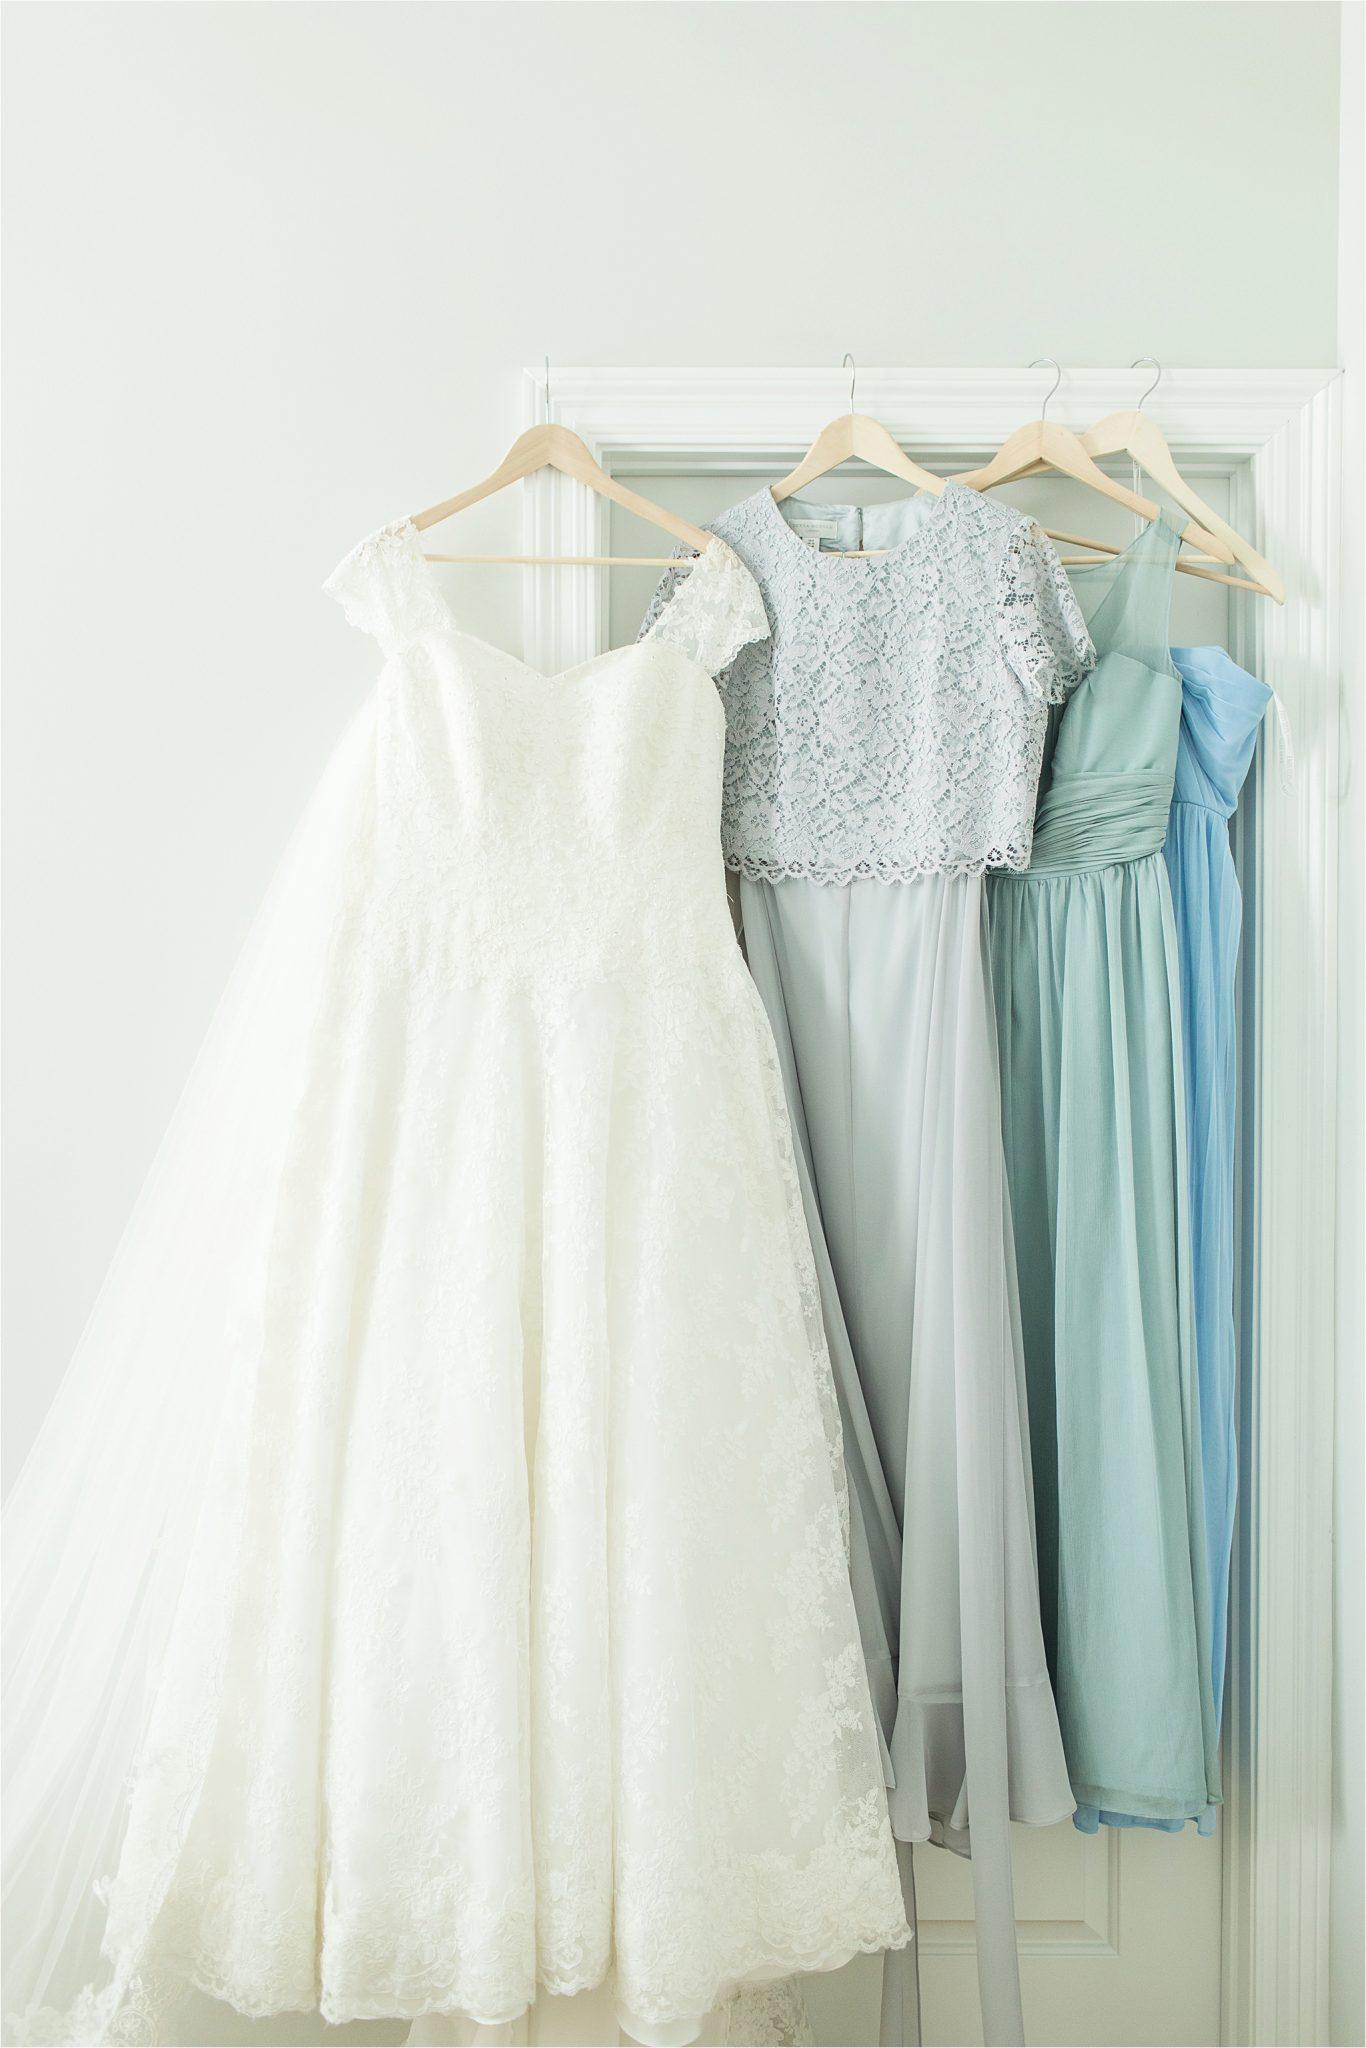 Wedding Dress-Bridesmaids Dress-Pastel Themed Wedding-The Chapel at the Waters-Montgomery Alabama Photographer-Miles & Meredyth-Pastel-Blue Wedding Theme